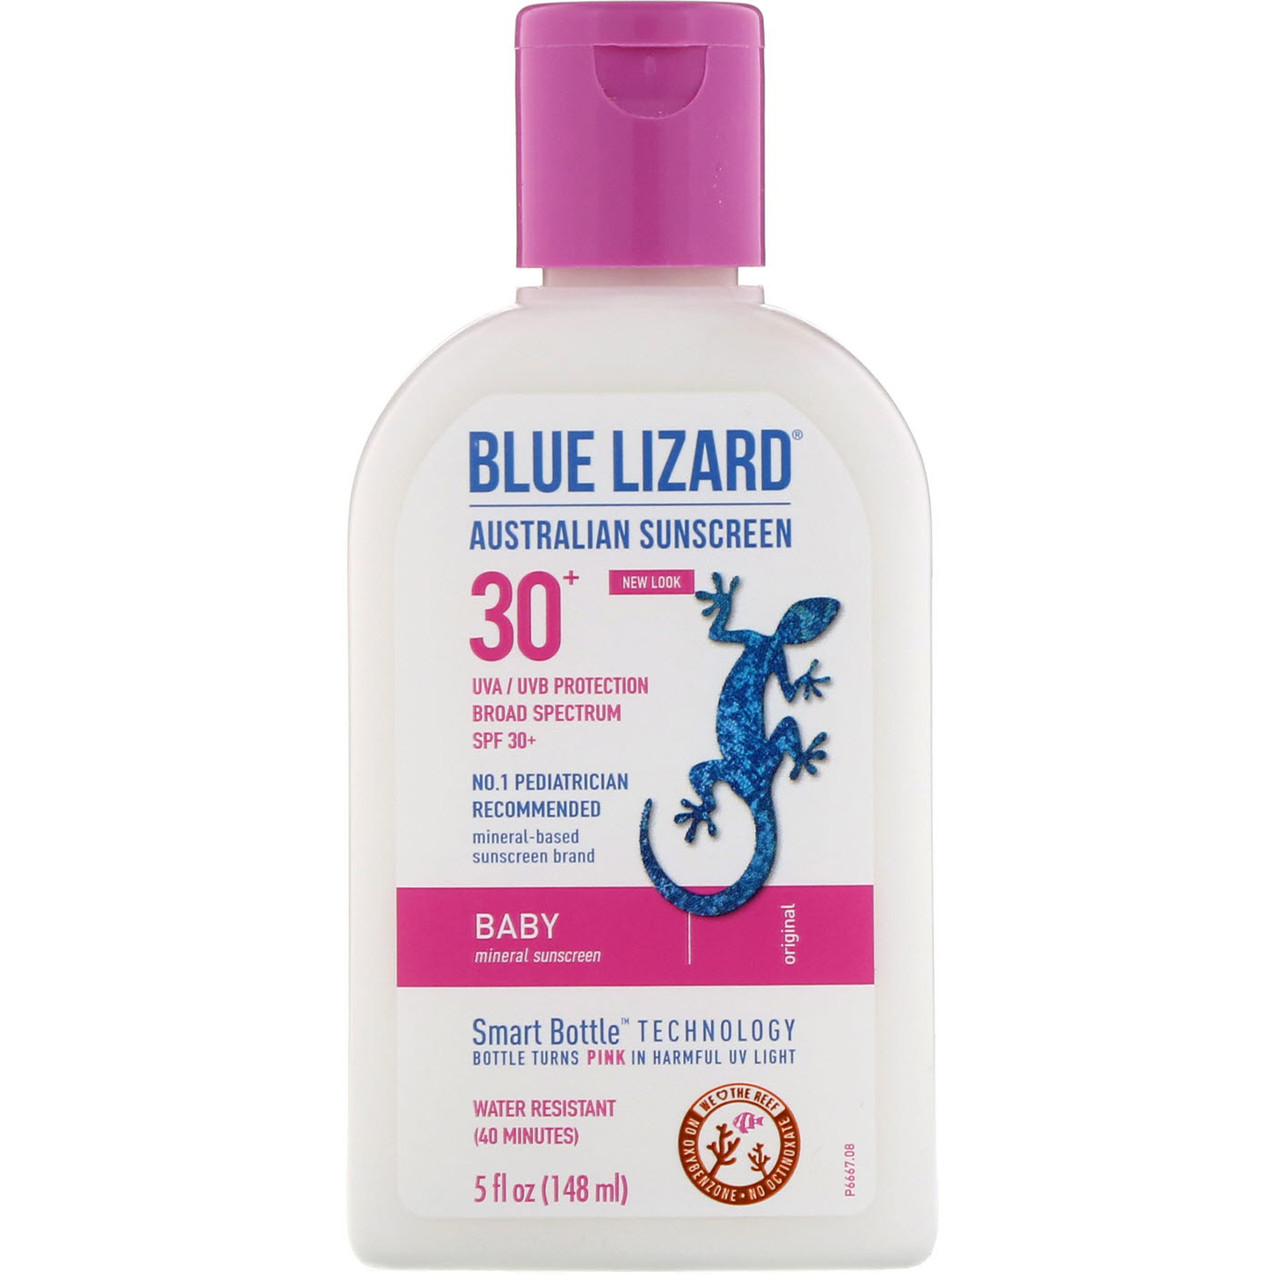 Солнцезащитный крем, для лица SPF 30 + Sunscreen, Blue Lizard Australian Sunscreen, 148 мл